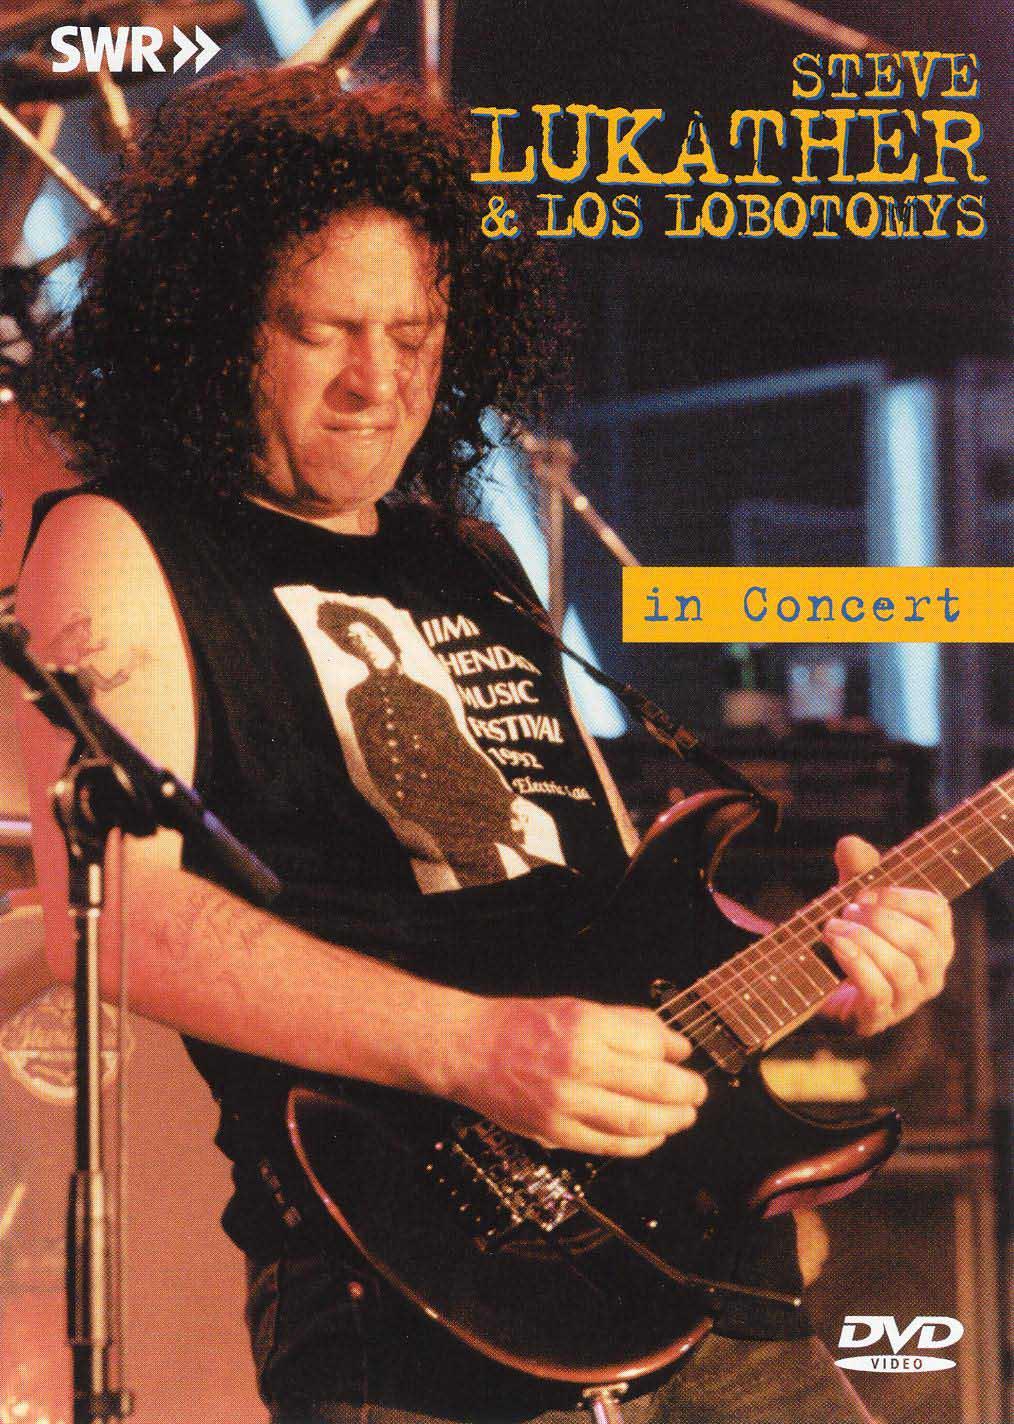 Ohne Filter - Musik Pur: Steve Lukather & Los Lobotomys in Concert